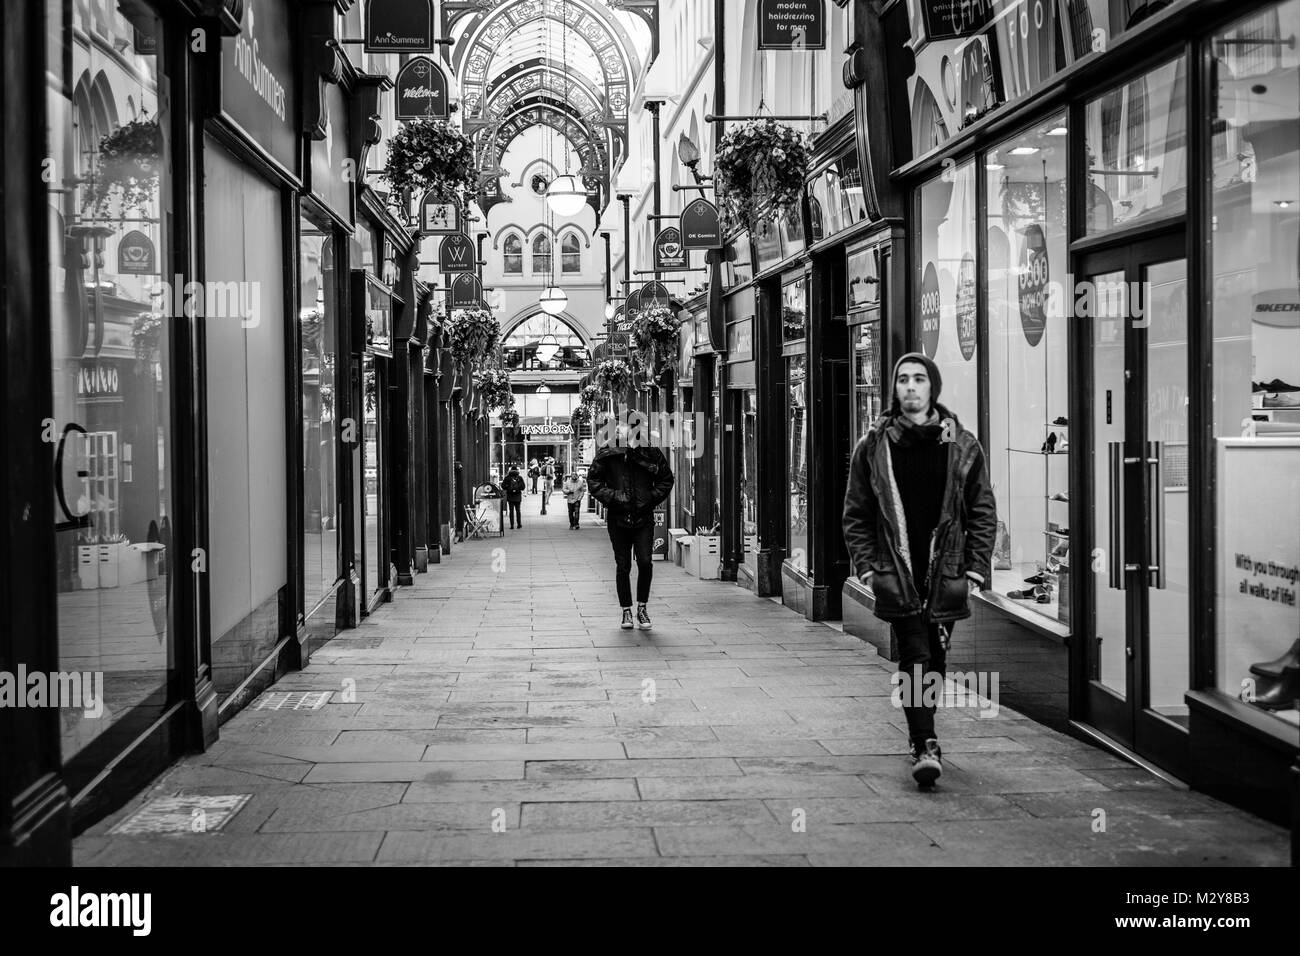 Thorntons Arcade, Leeds City Centre, West Yorkshire, England UK - Stock Image